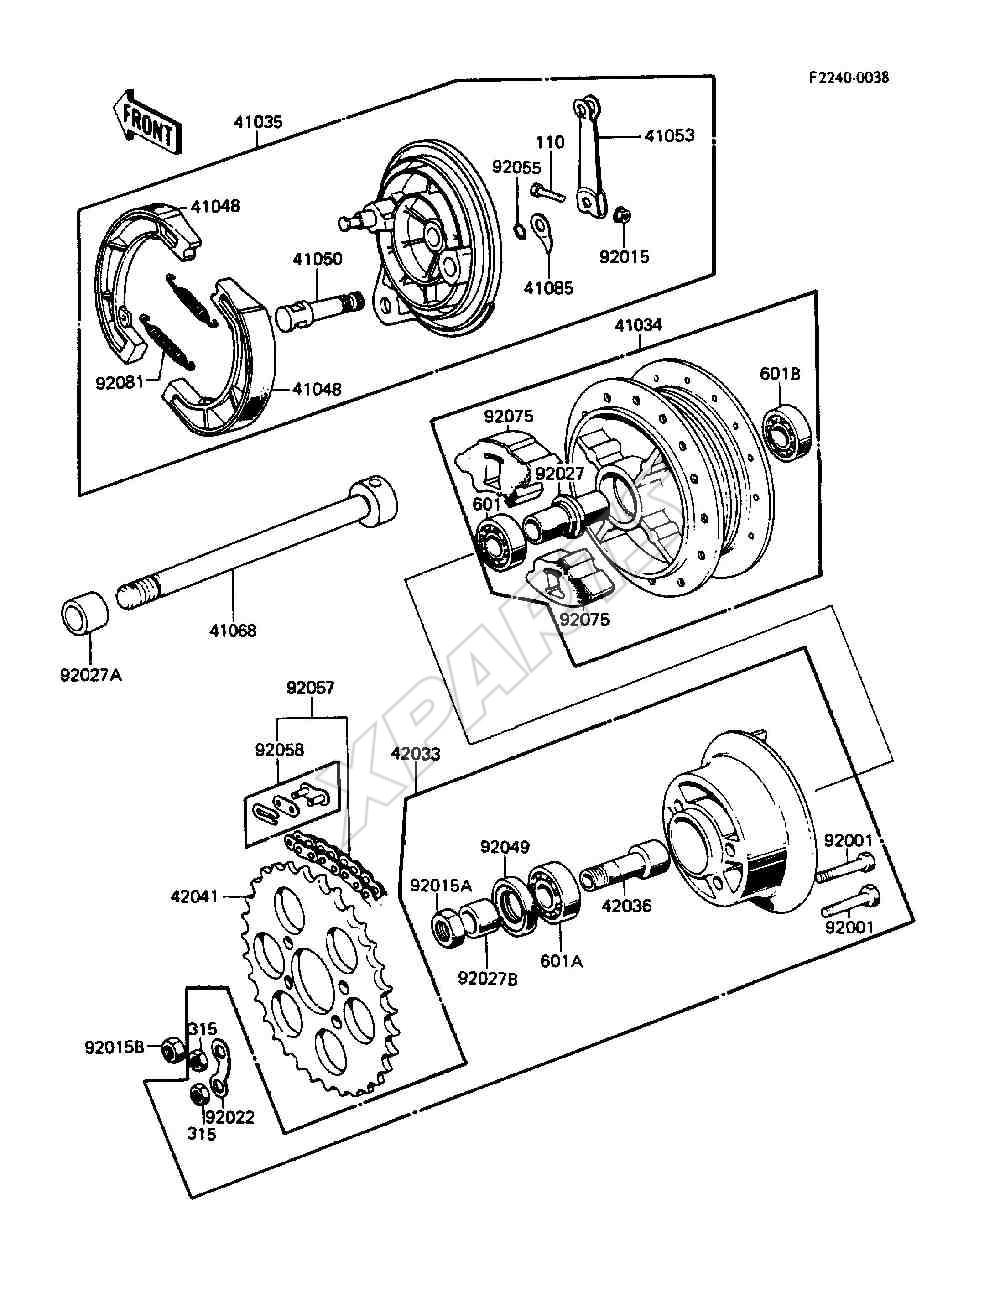 2003 jeep liberty alternator bedradings schema